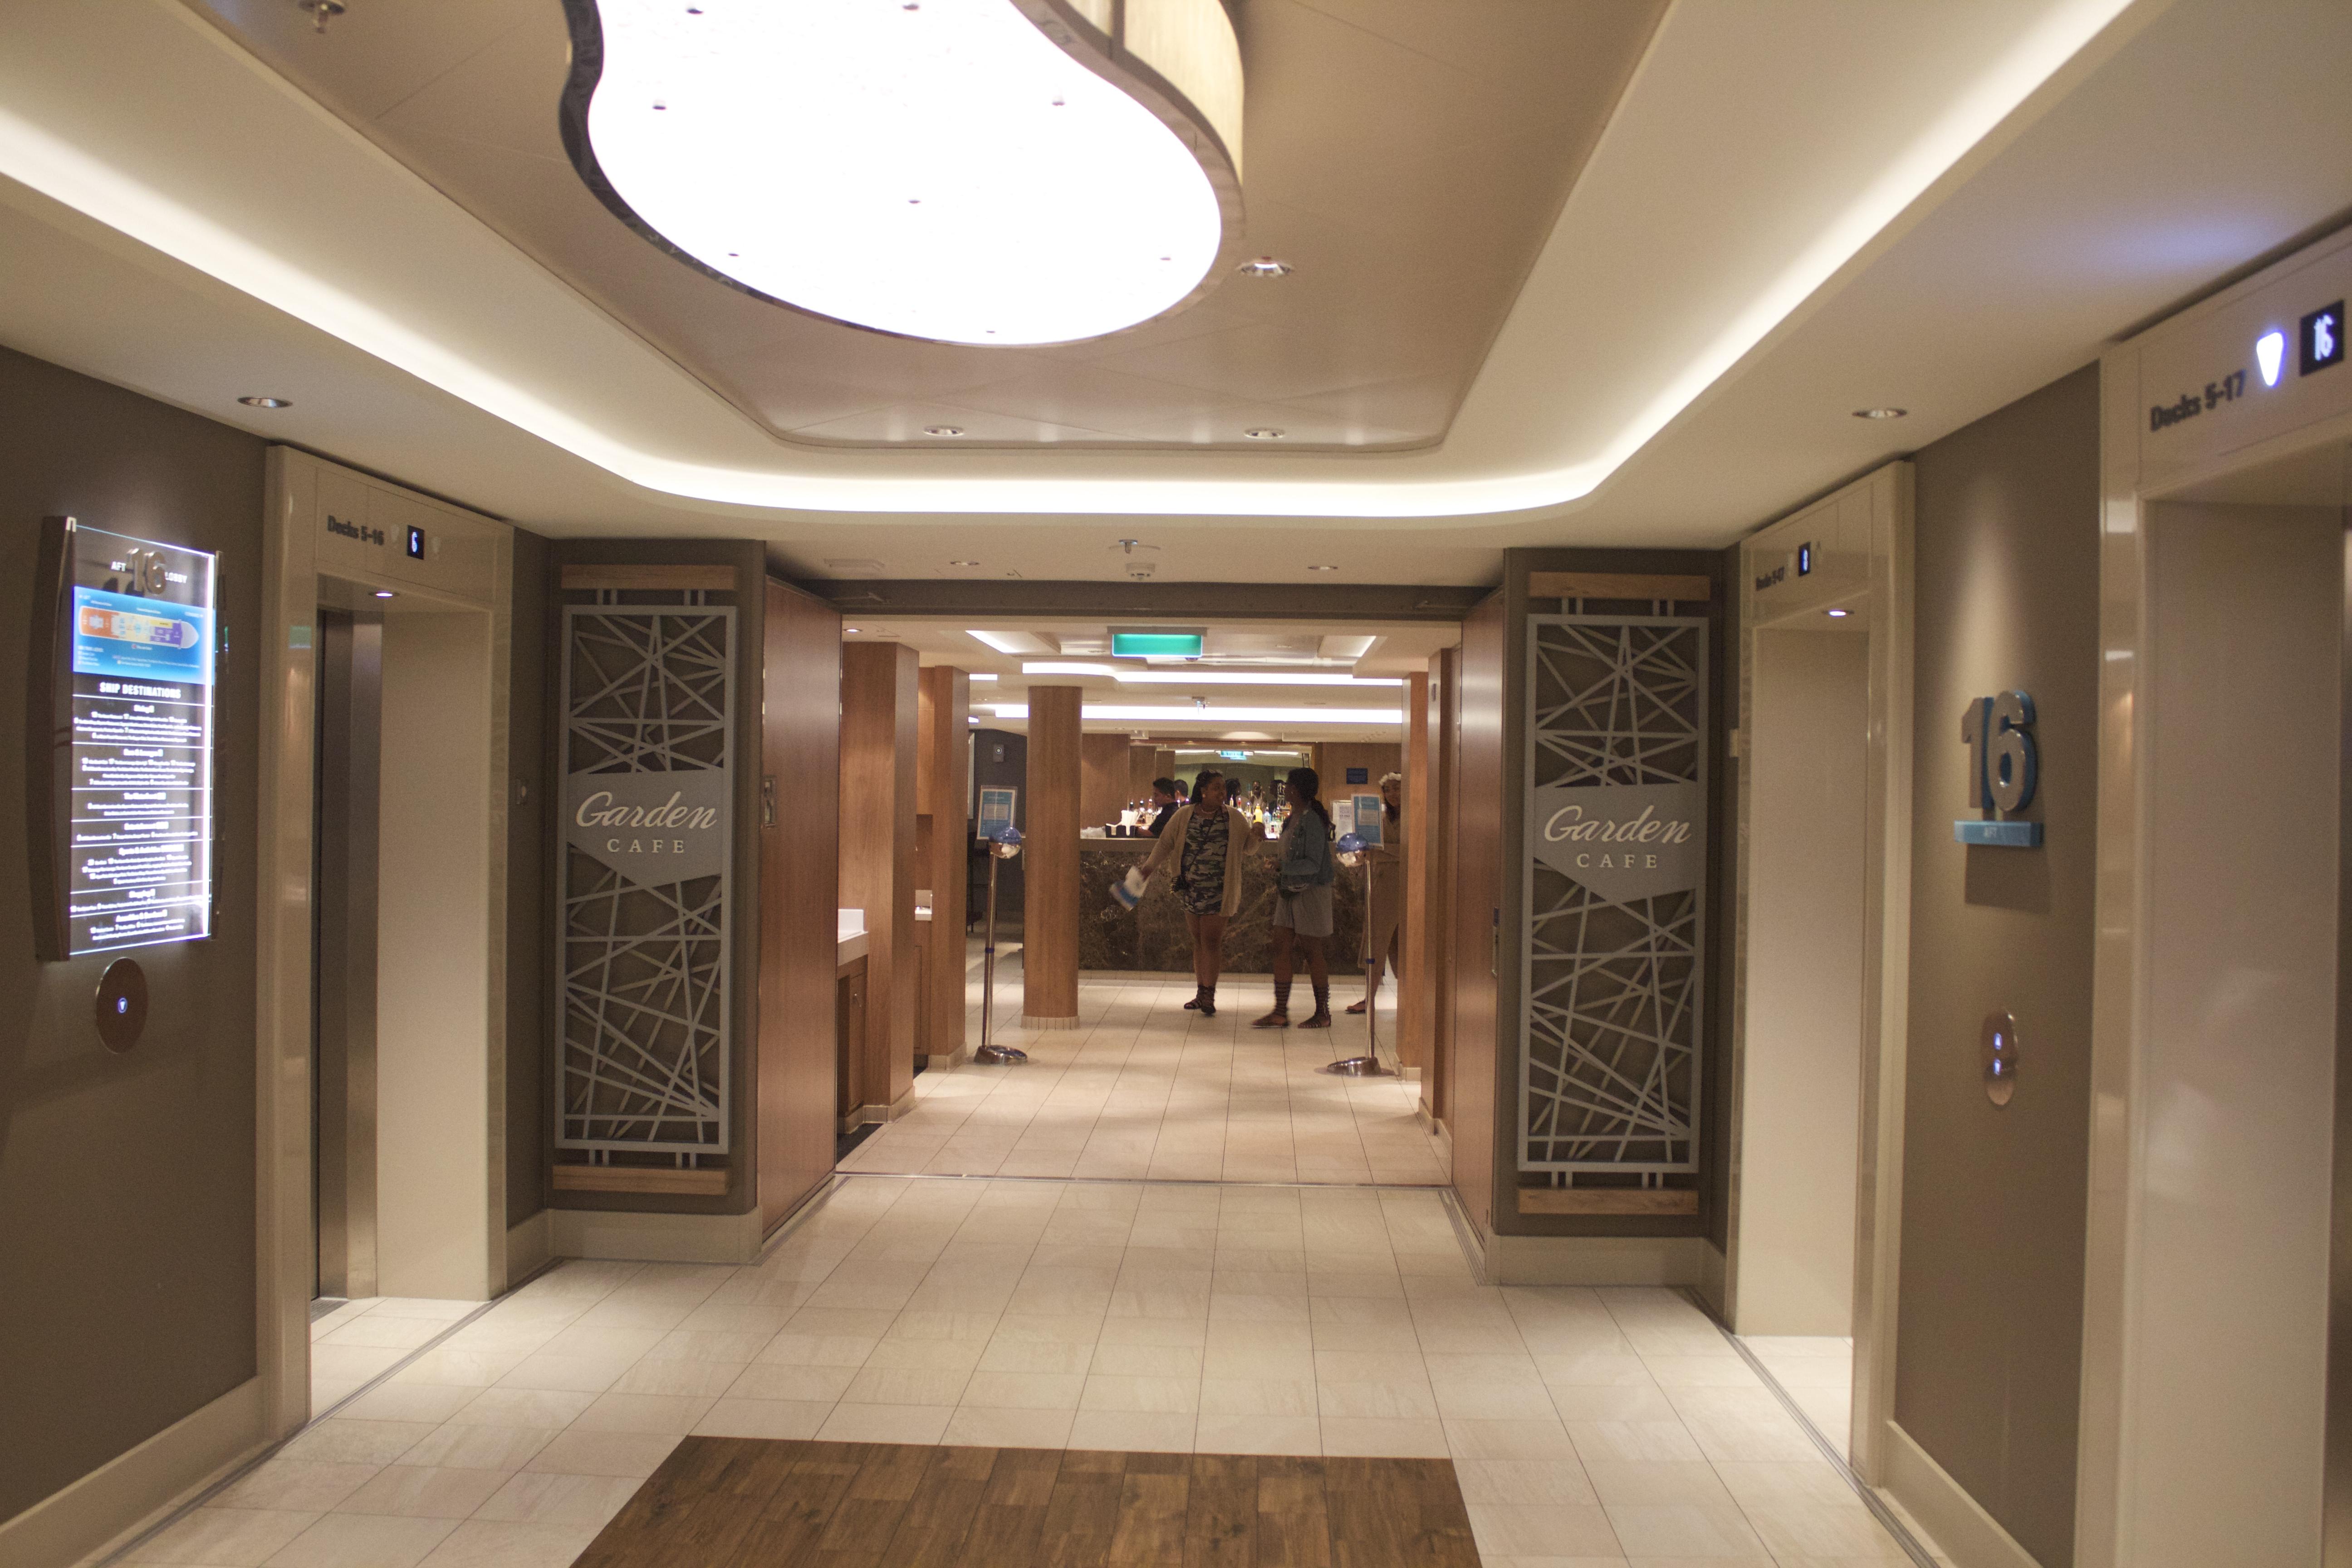 norwegian escape garden cafe-entrance-elevators